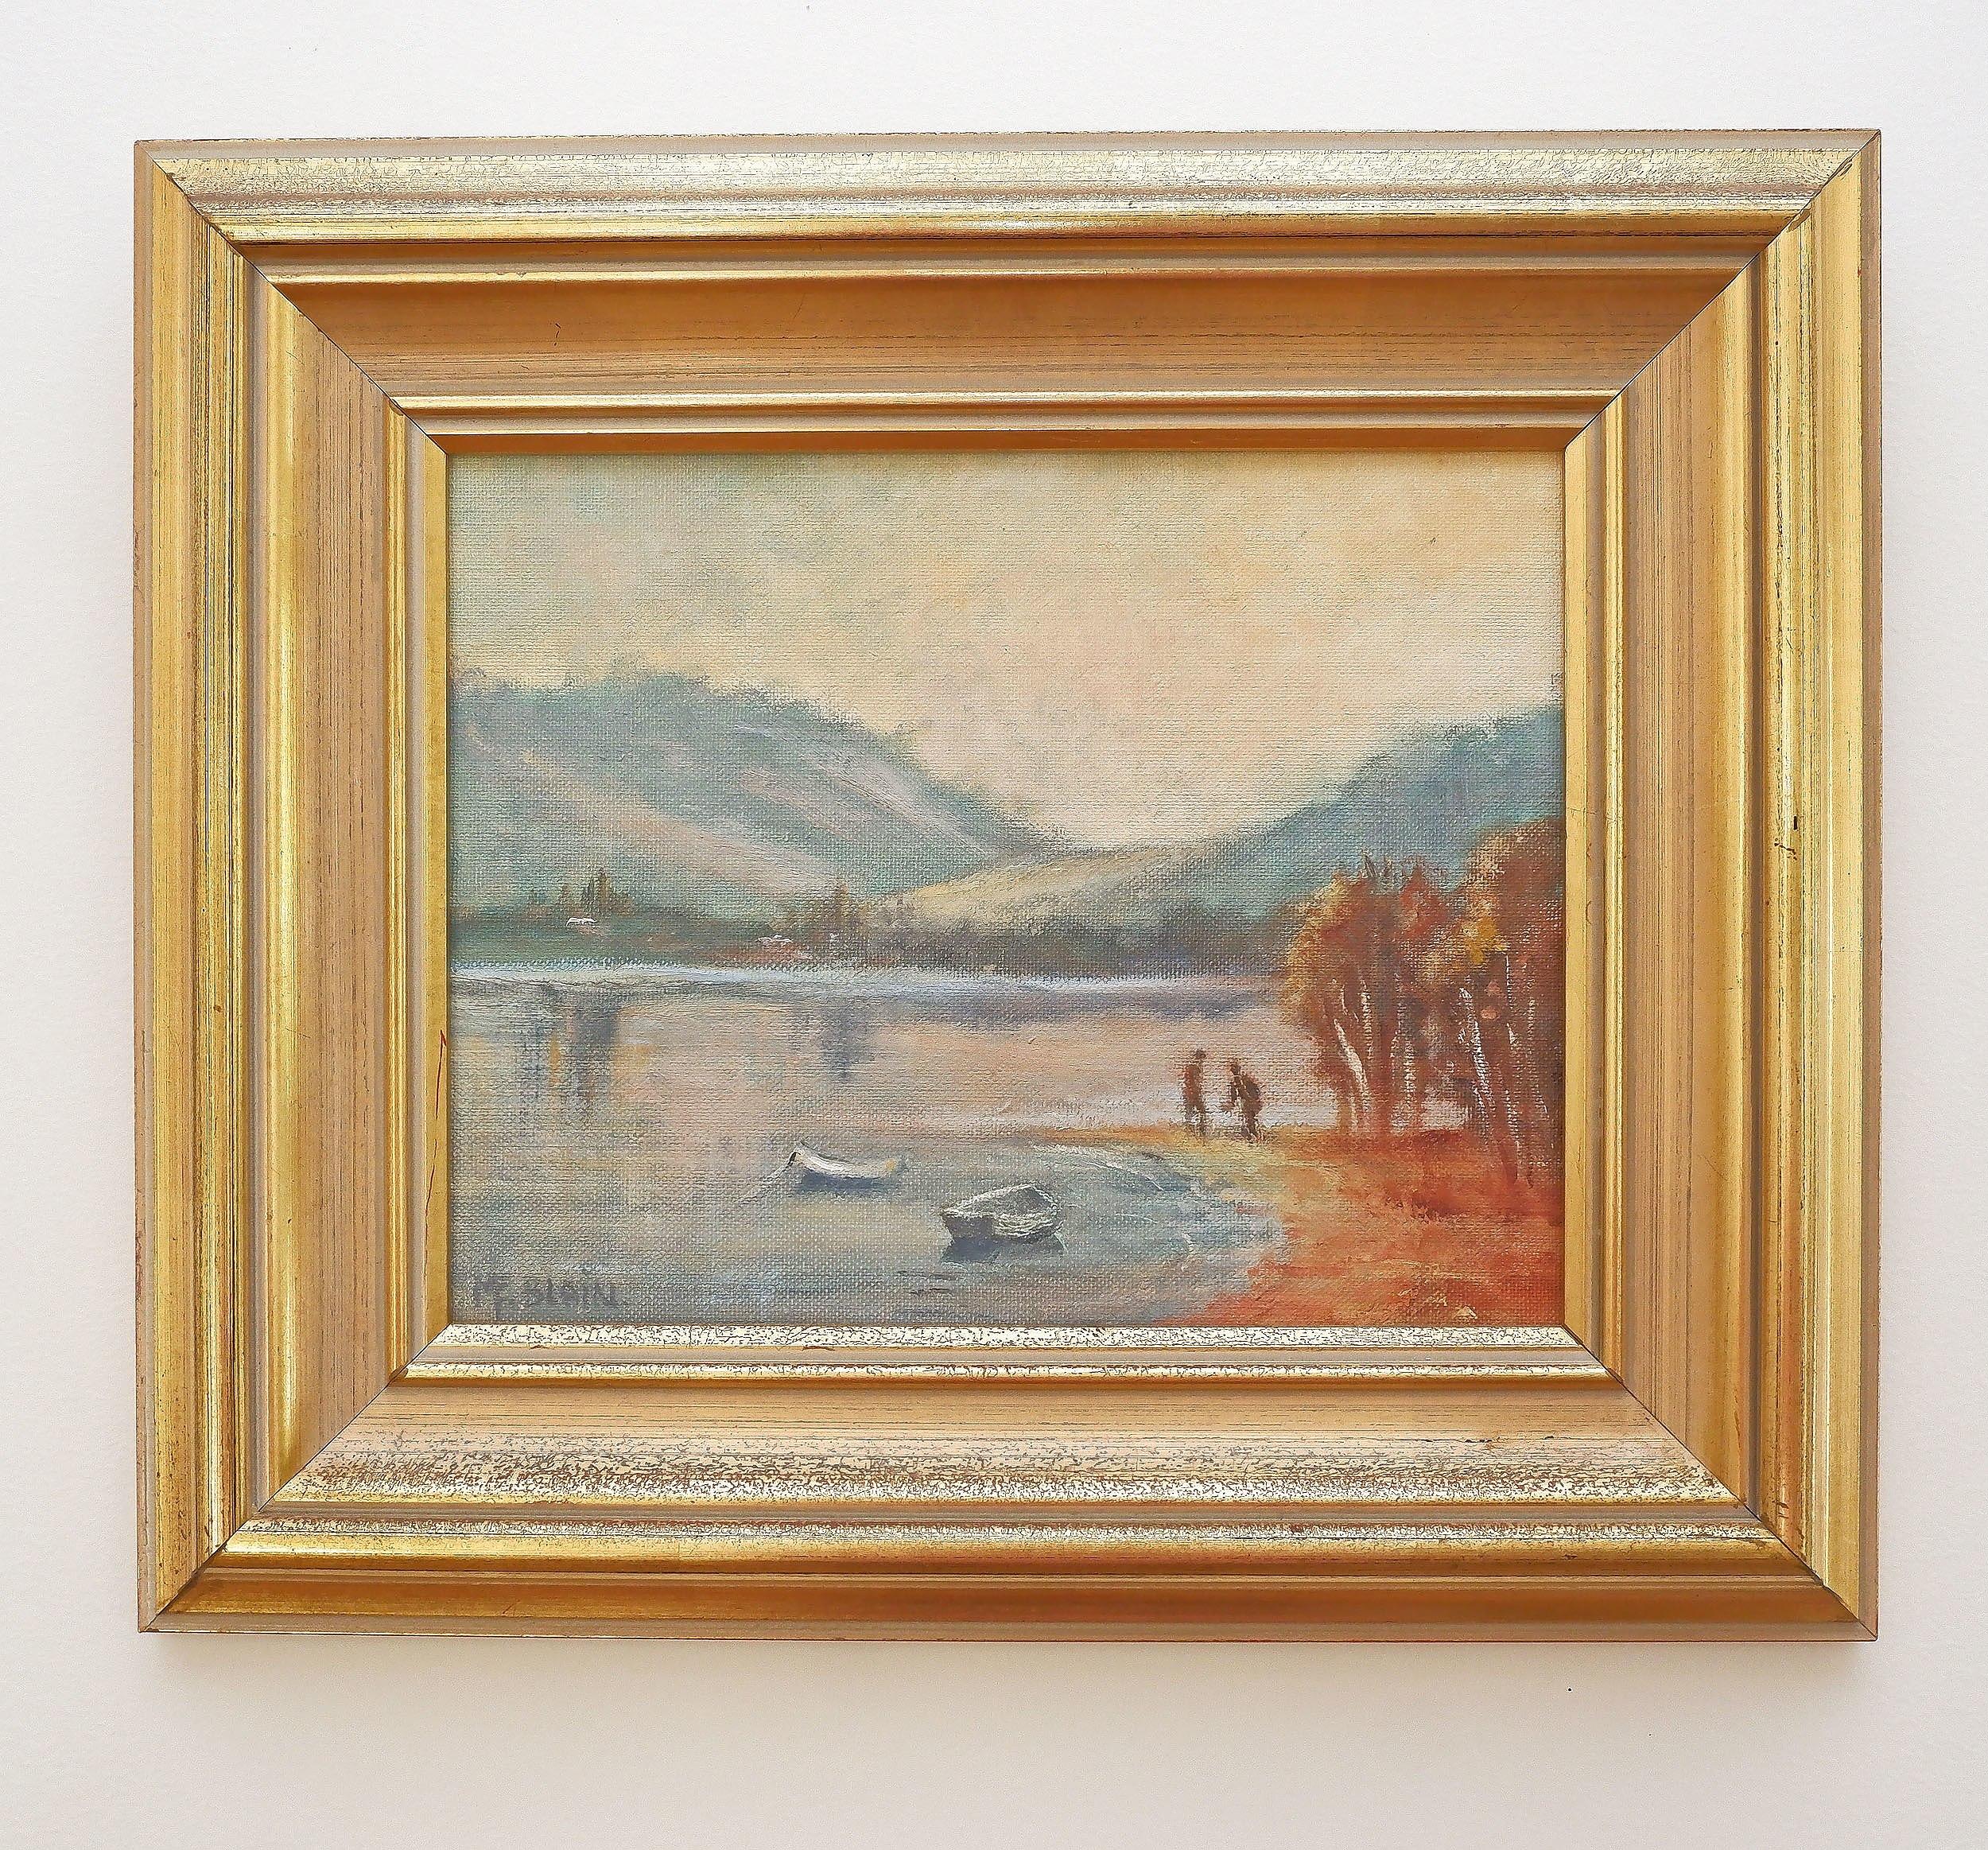 'M. F. Blain (20th Century), Untitled (Lakescene), Oil on Canvas'